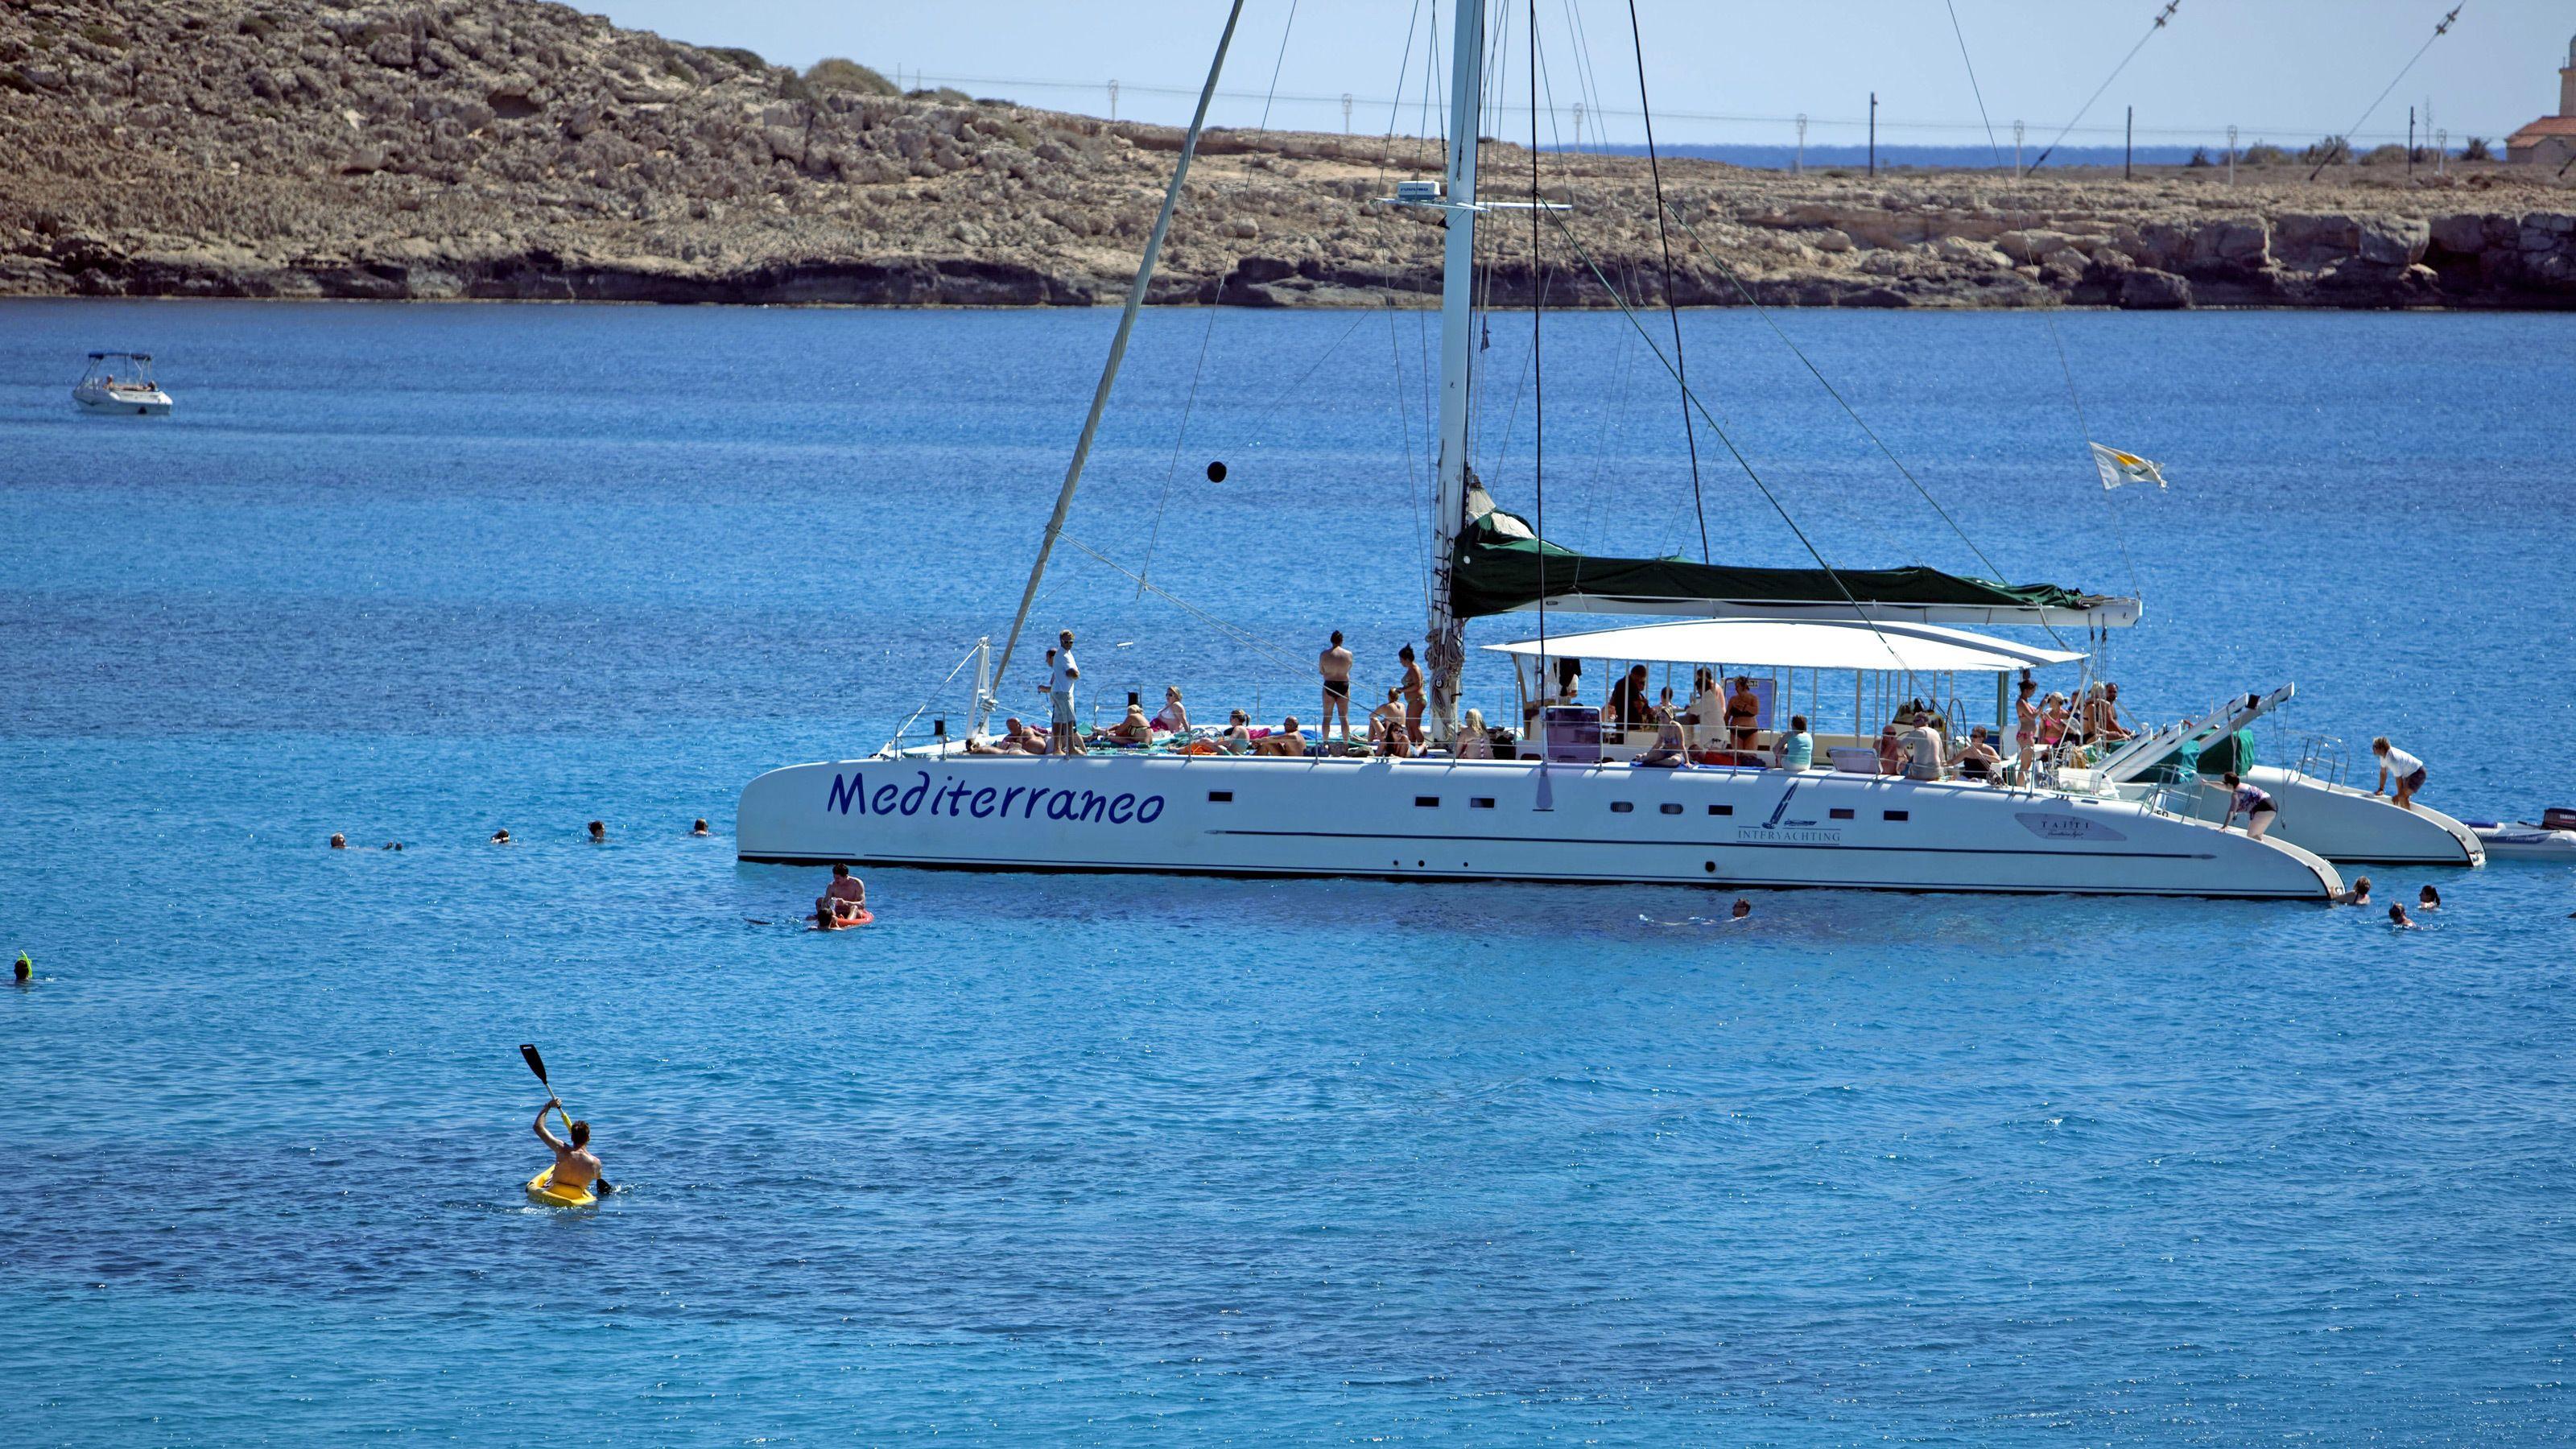 Kayakers paddle around an anchored catamaran full of people